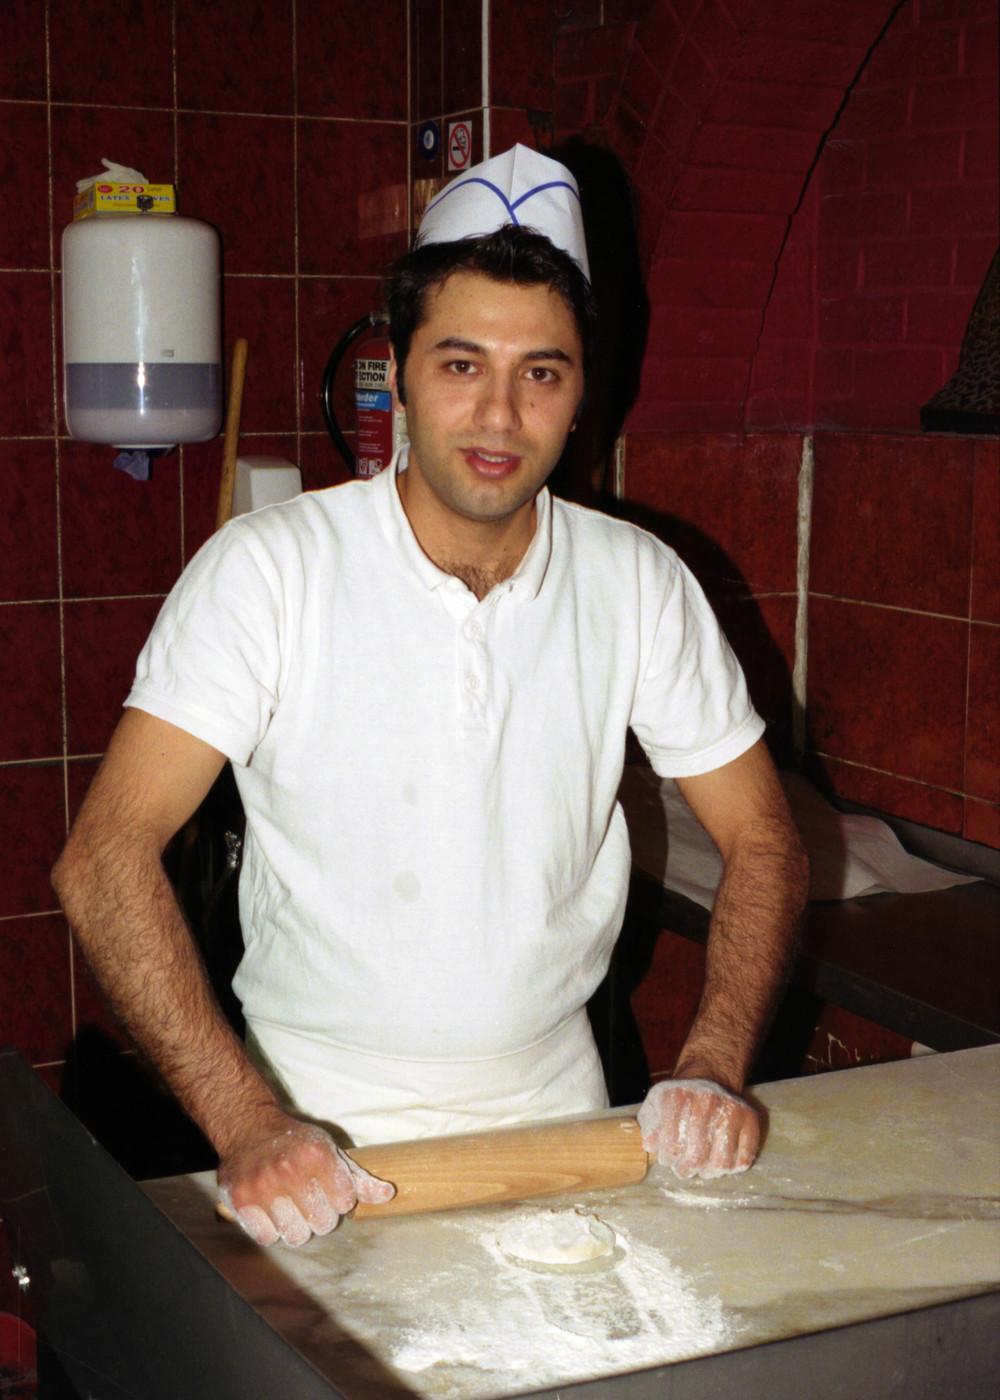 chef_1 4.jpg